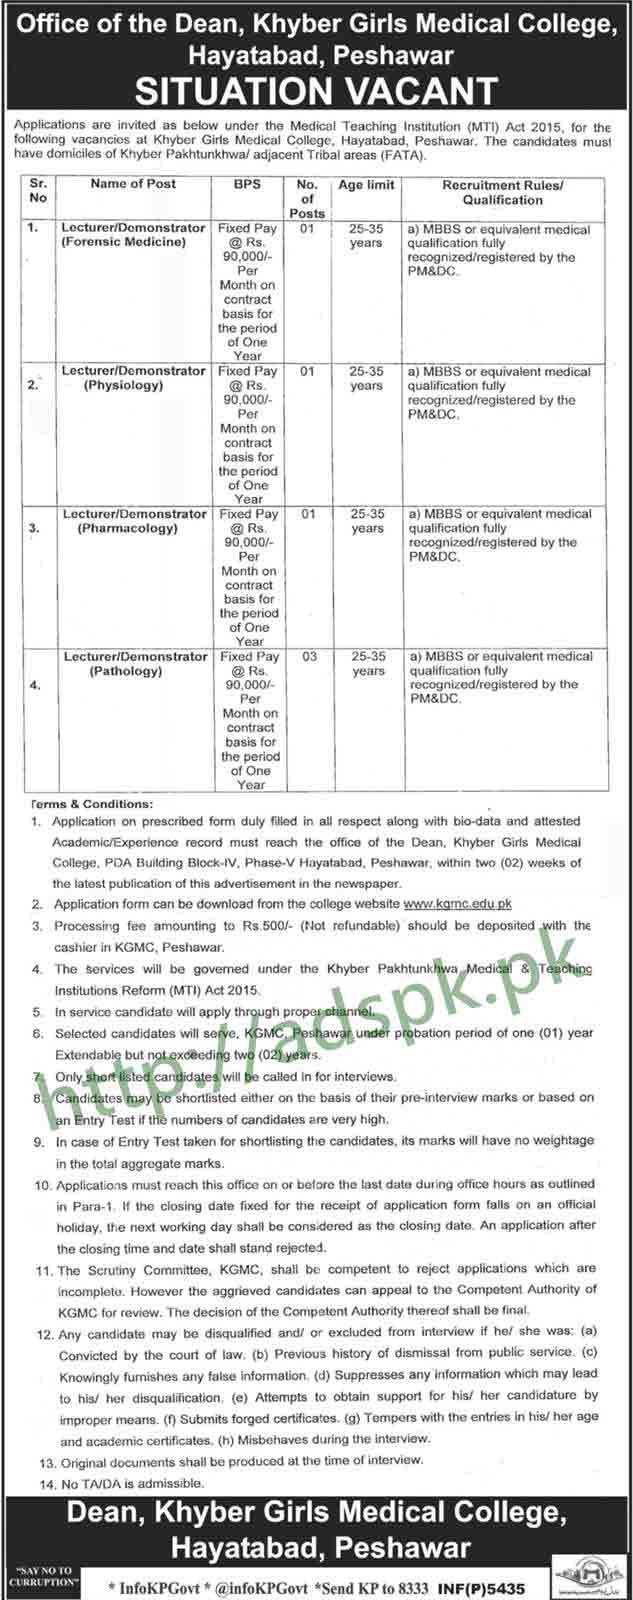 Jobs Khyber Girls Medical College Hayatabad Peshawar KPK Jobs 2017 Lecturers Demonstrators Various Disciplines Jobs Application Form Deadline 05-10-2017 Apply Now